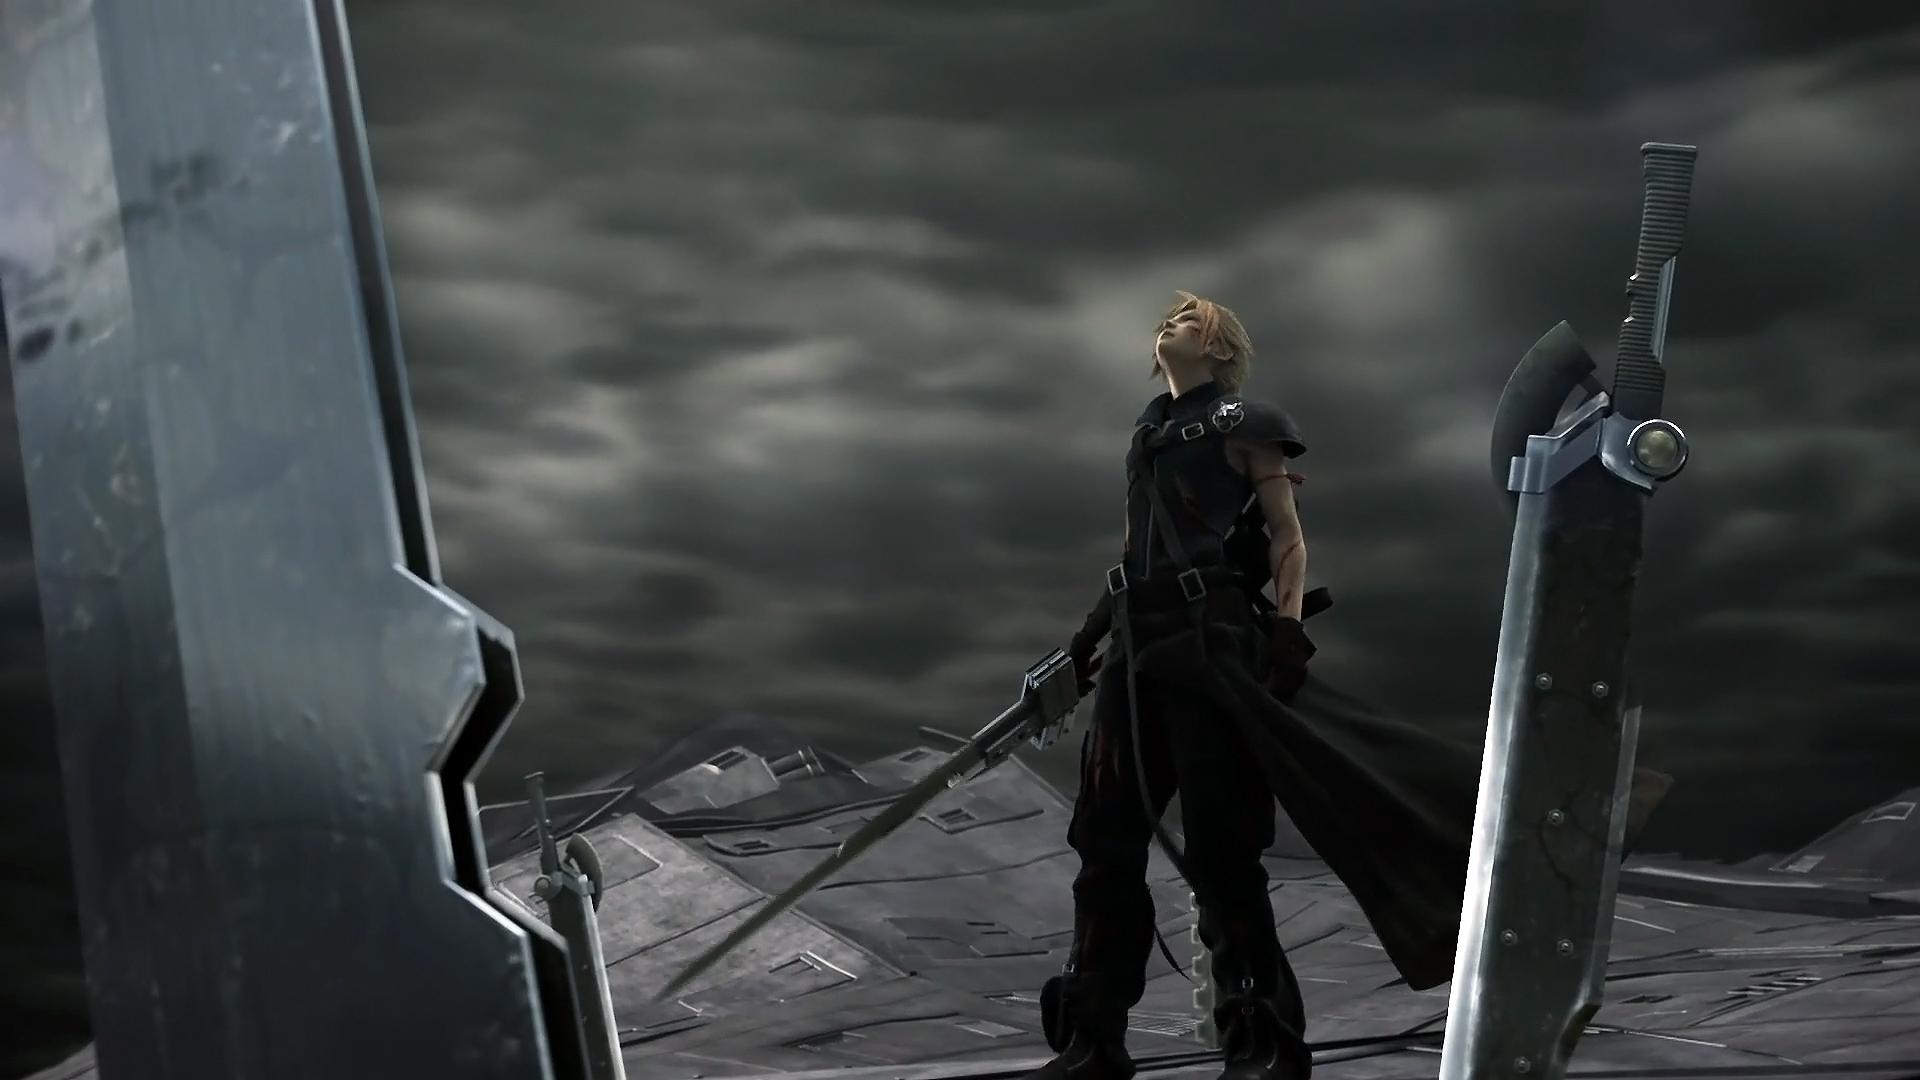 Tags Anime Nomura Tetsuya Final Fantasy VII Cloud Strife Buster Sword